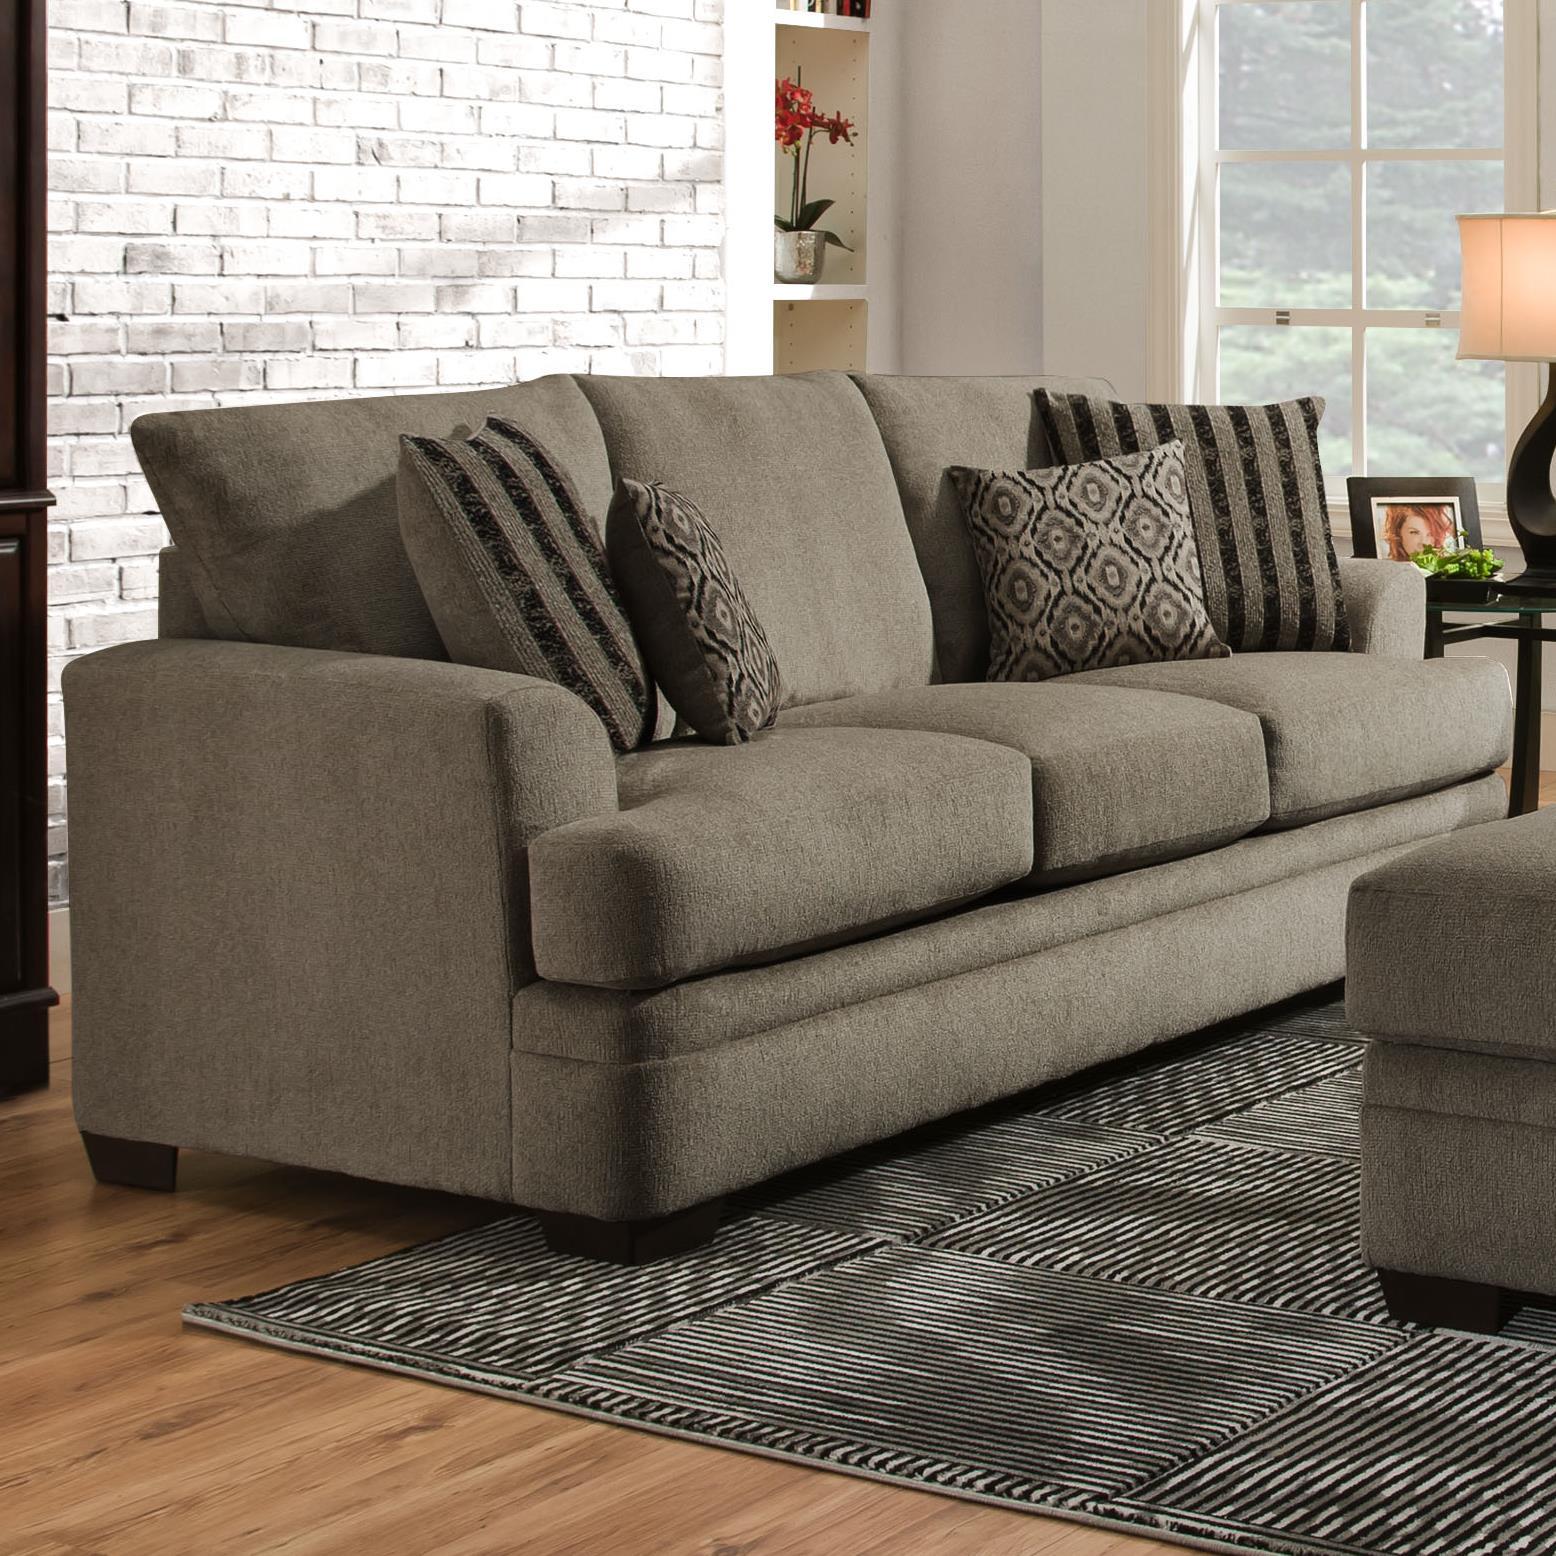 3650 Sofa by Peak Living at Prime Brothers Furniture